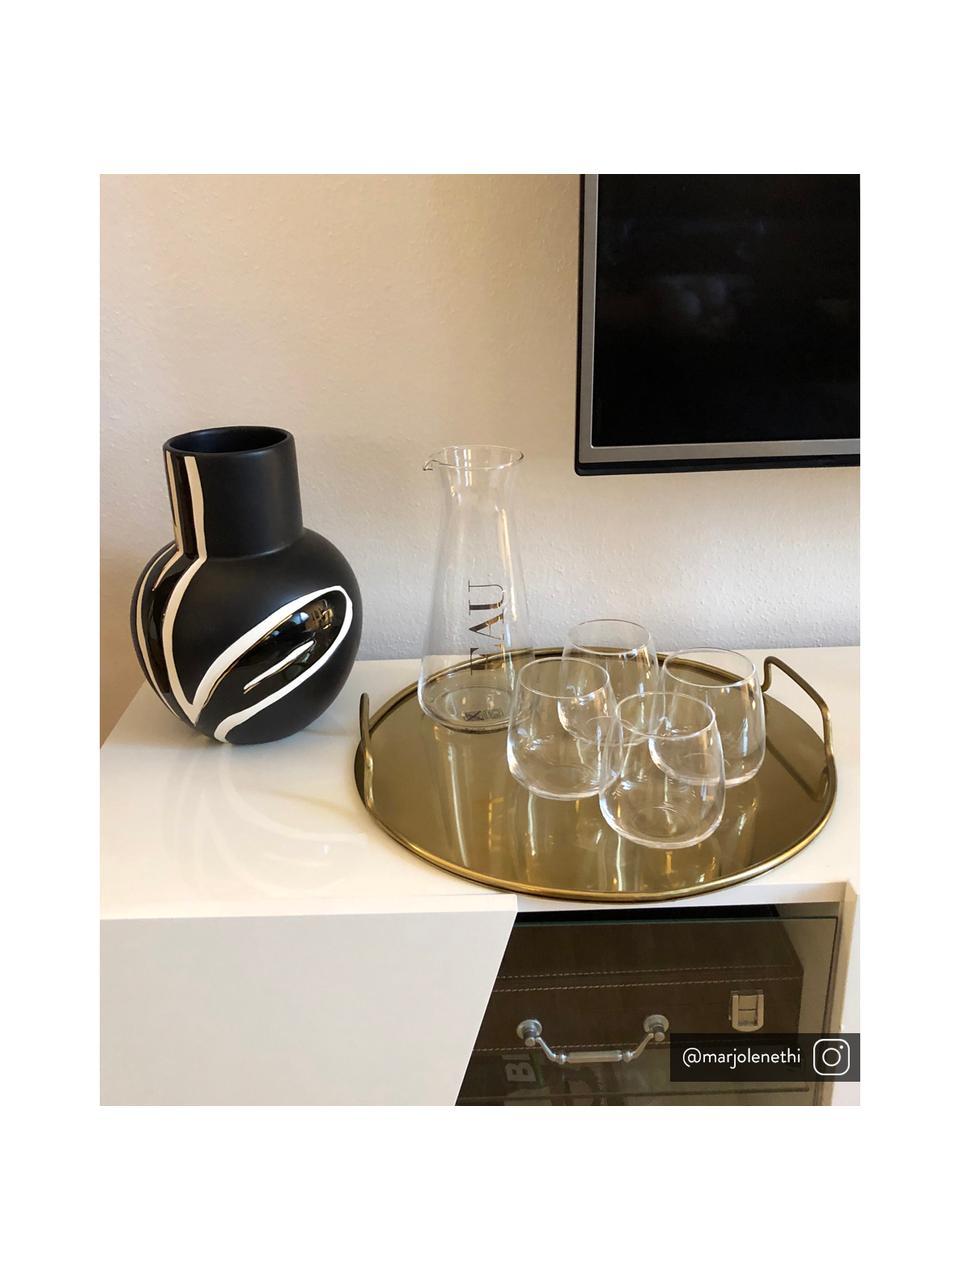 Glaskaraffe Eau mit goldenem Schriftzug, 1 L, Glas, Transparent, Goldfarben, H 23 cm